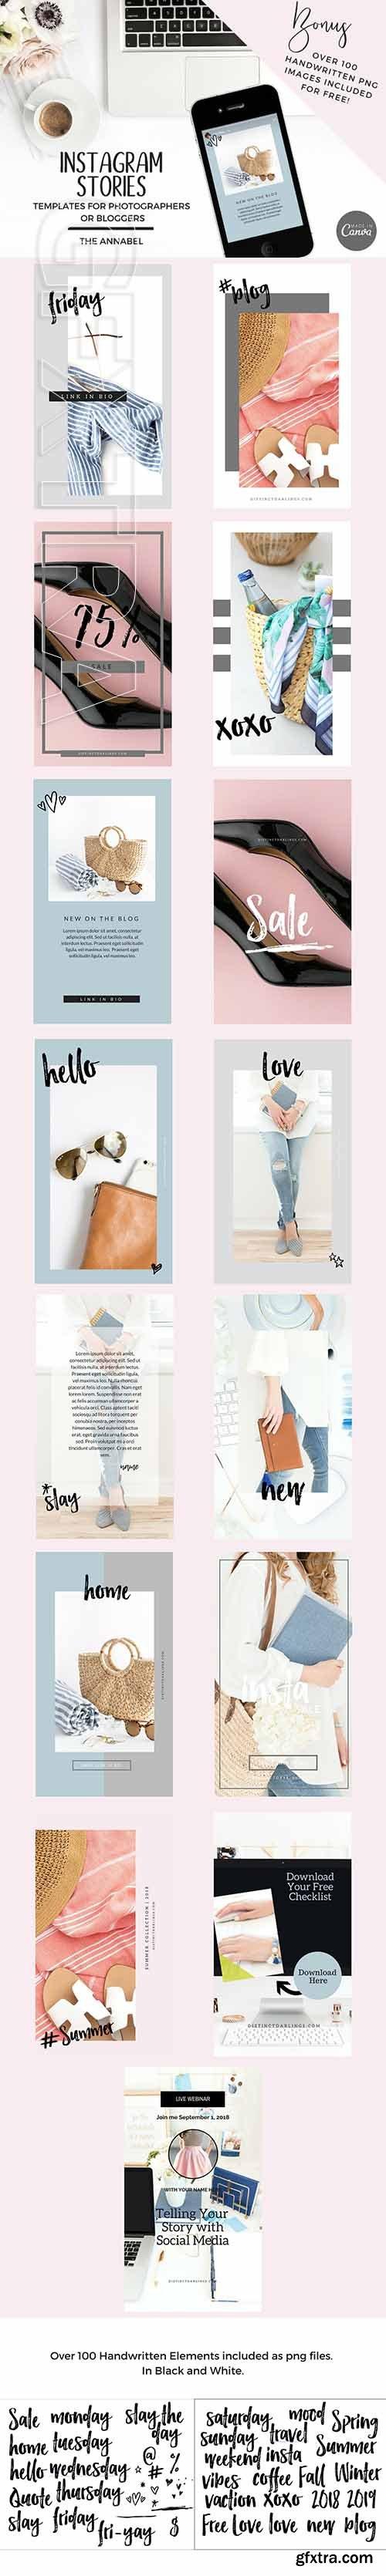 CreativeMarket - Canva Instagram Stories Template 2709473